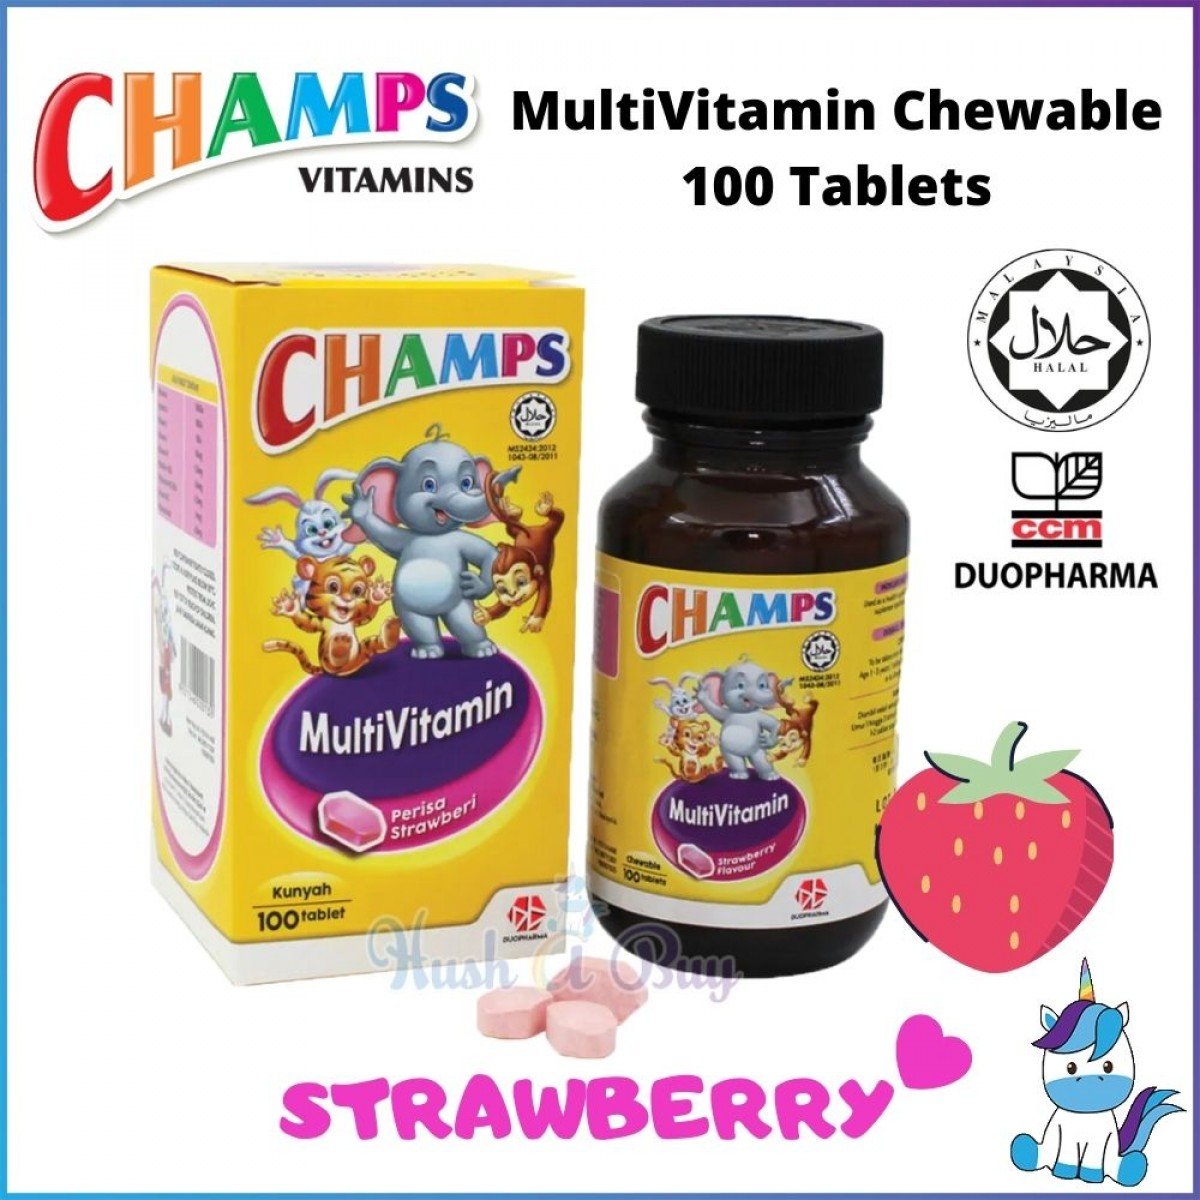 Champs Vitamin C/ Multivitamin 100mg - 100 tablet - Orange | BlackCurrent | Strawberry (HALAL)